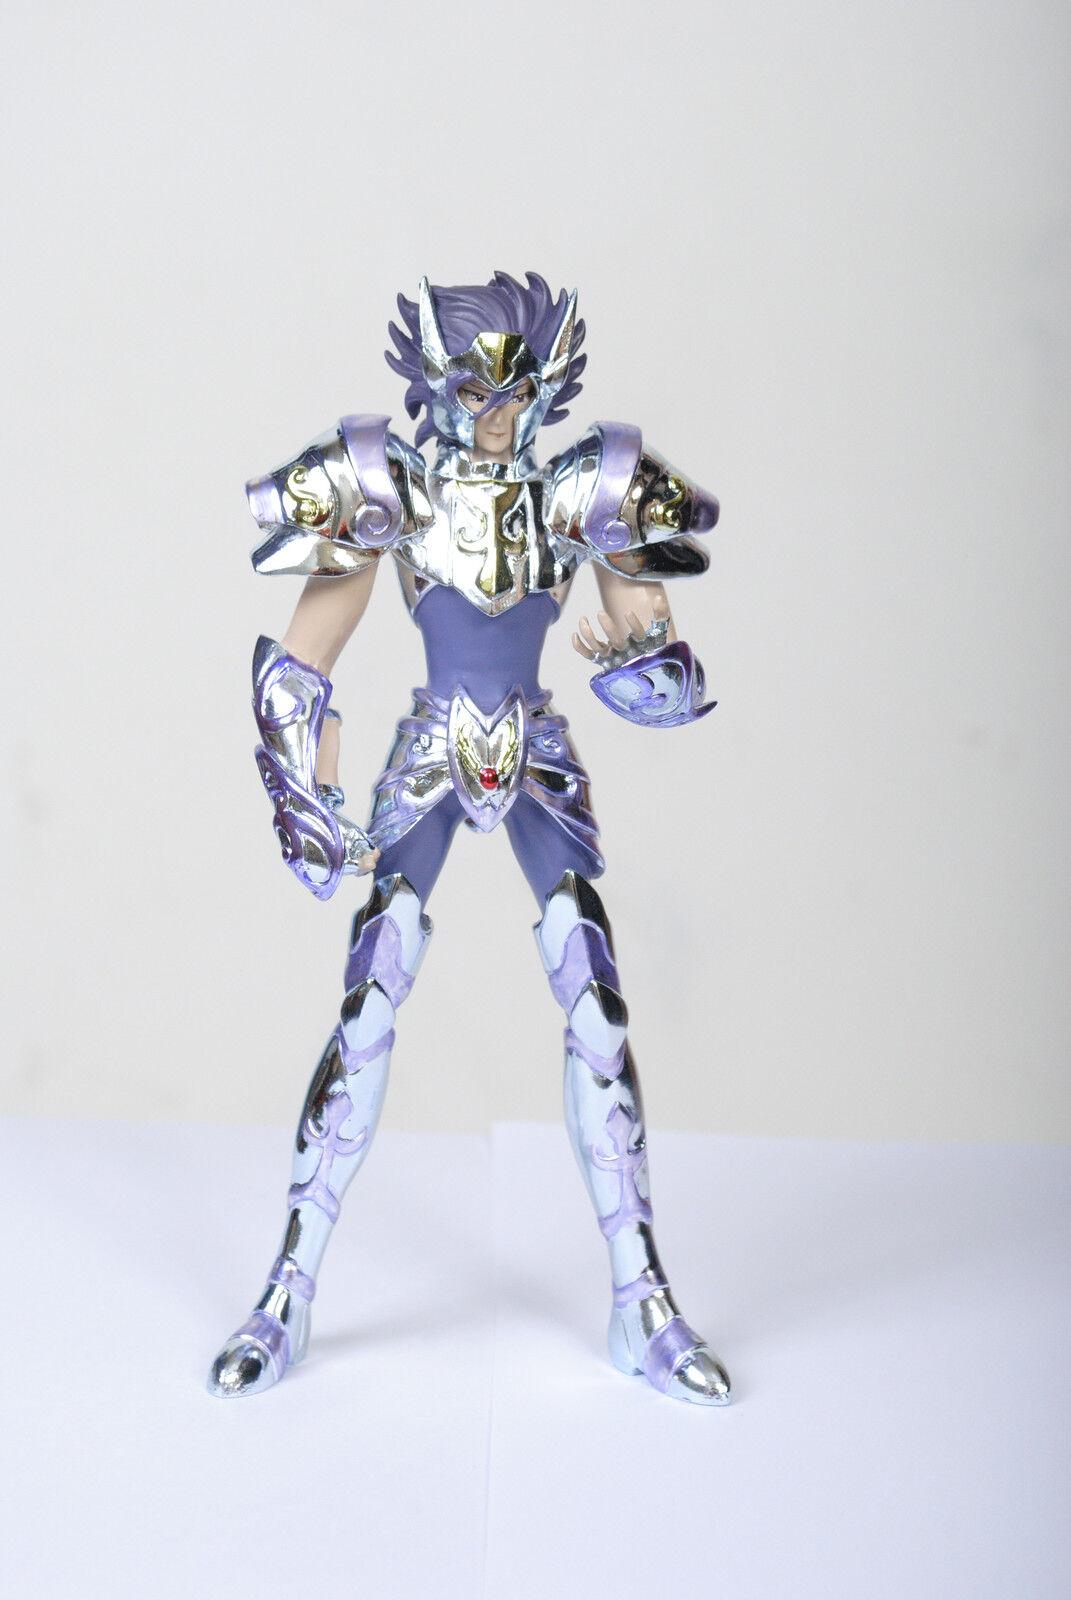 KAKA Saint Seiya Next Dimension Argent Crateris Suikyo Figurine